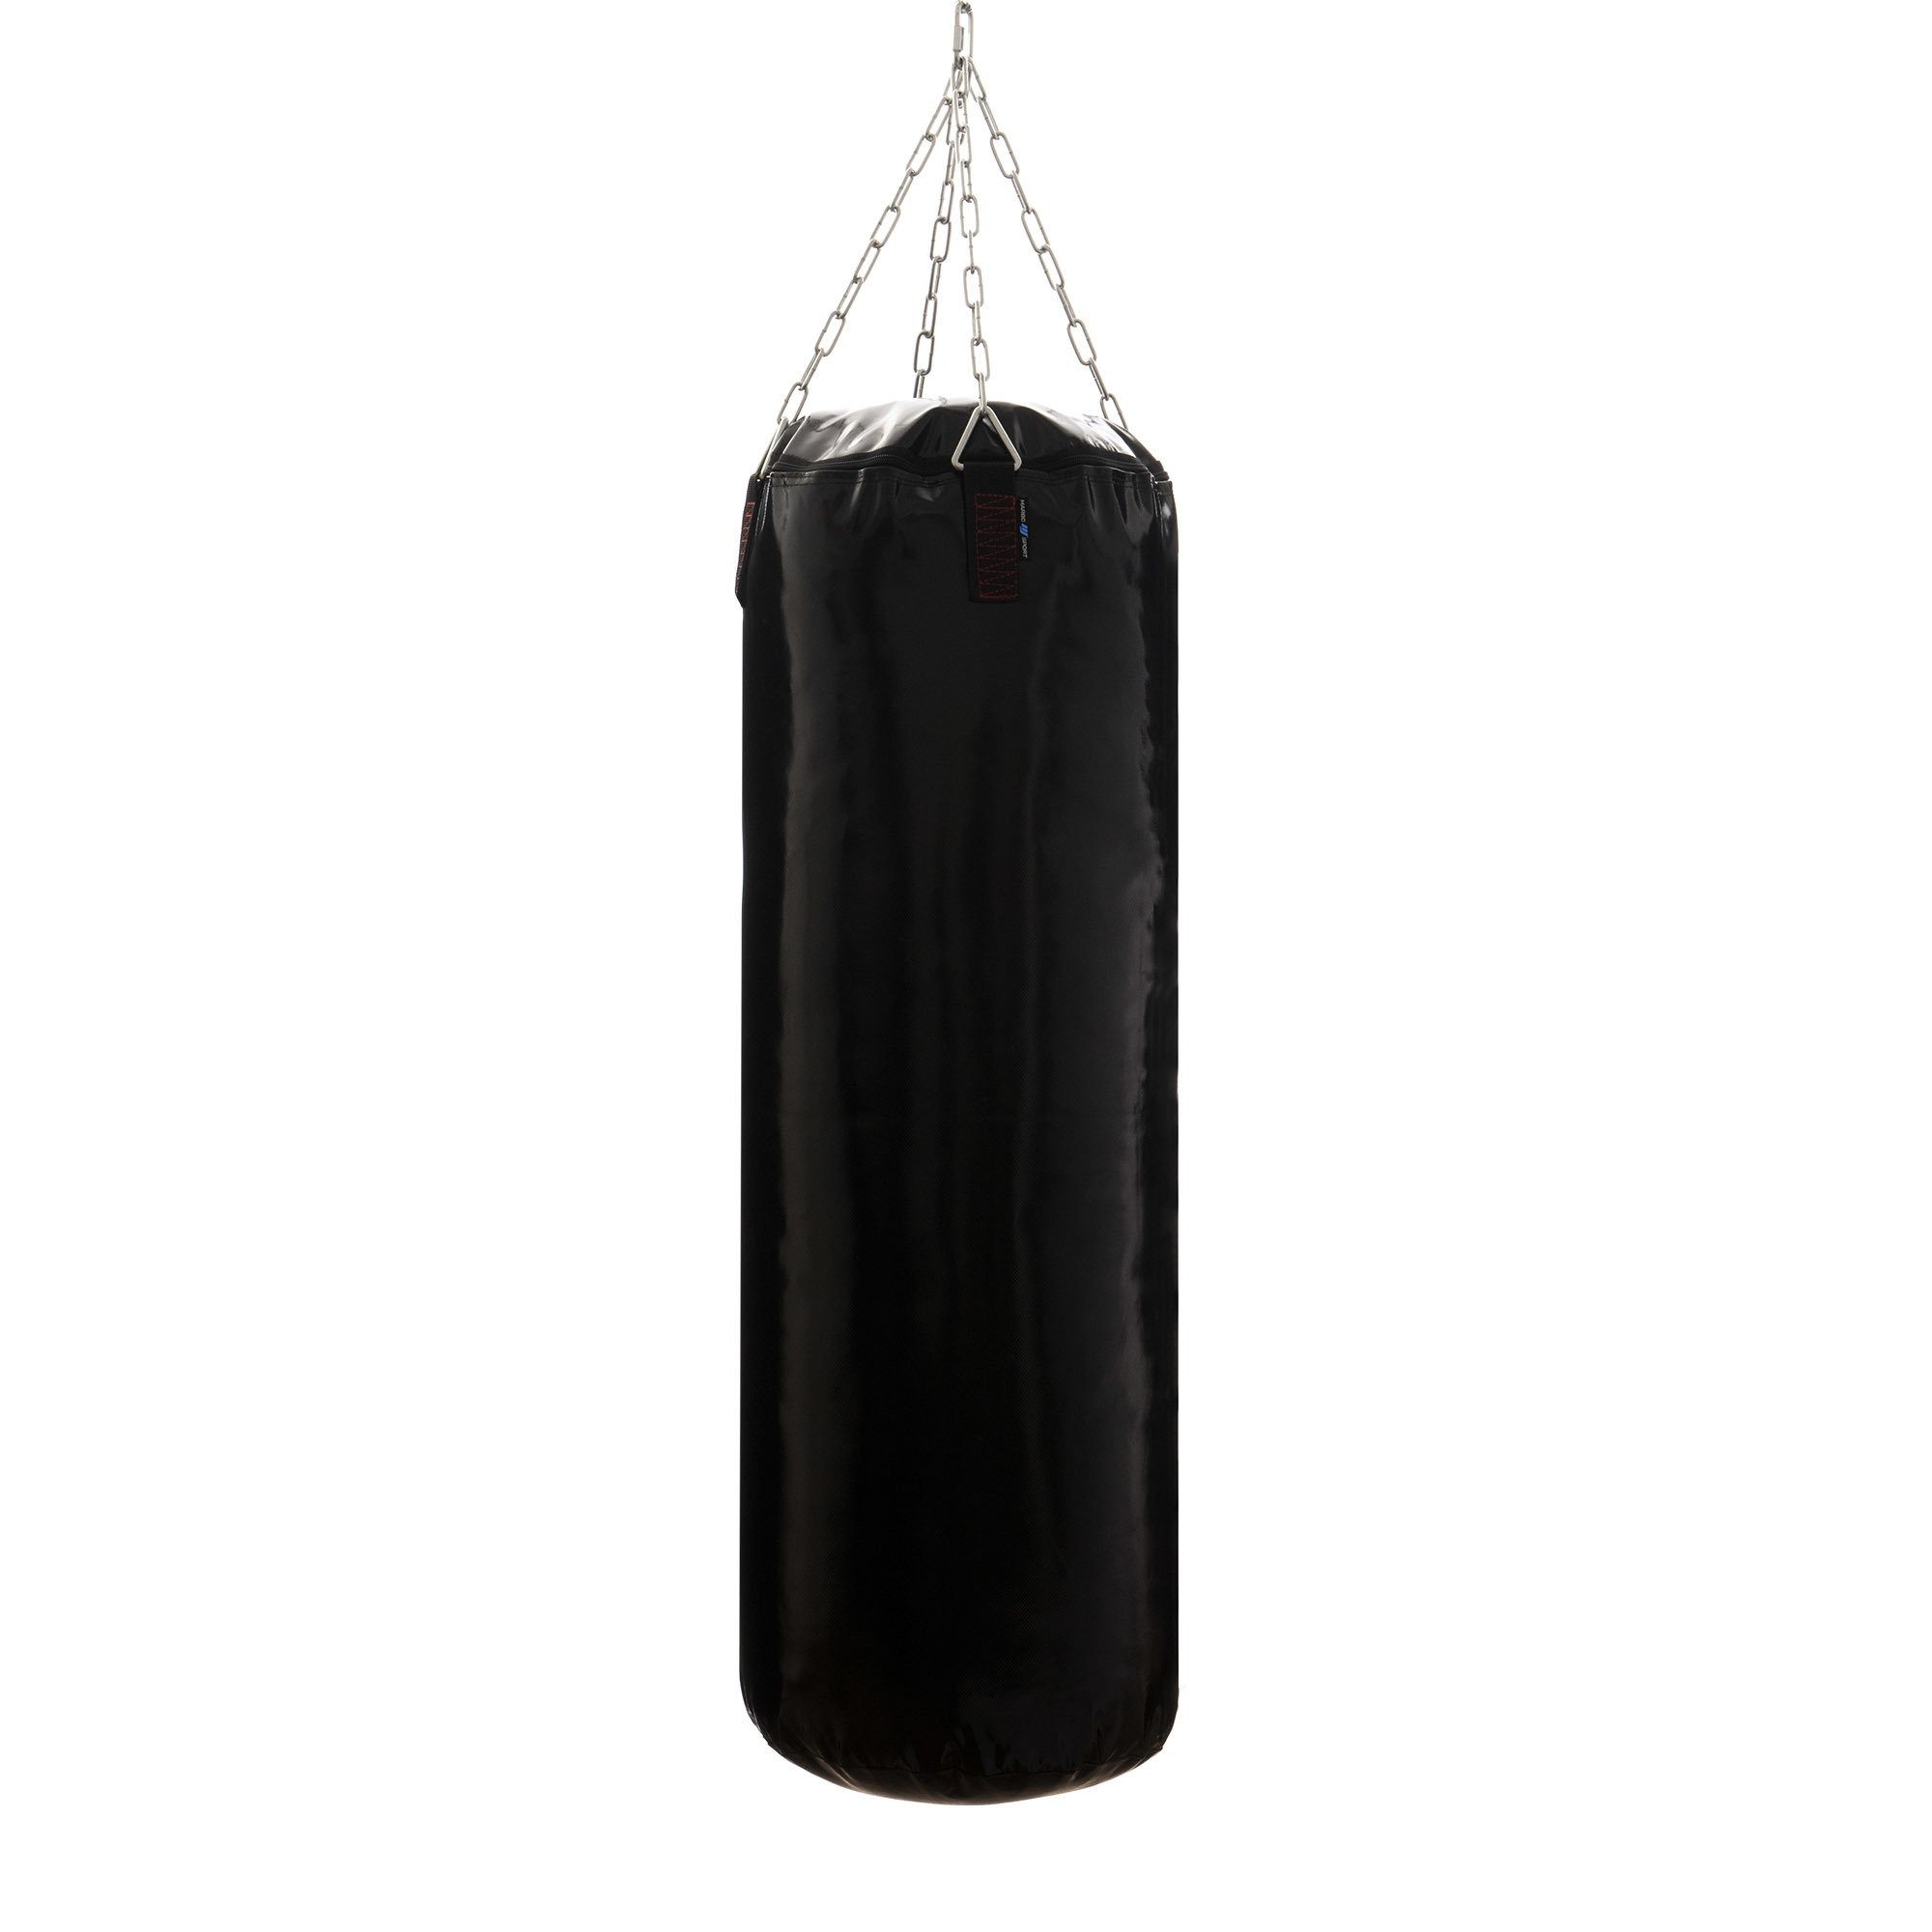 Image of Worek bokserski 130 cm fi45 cm + torpeda mc-w130|45 - marbo sport